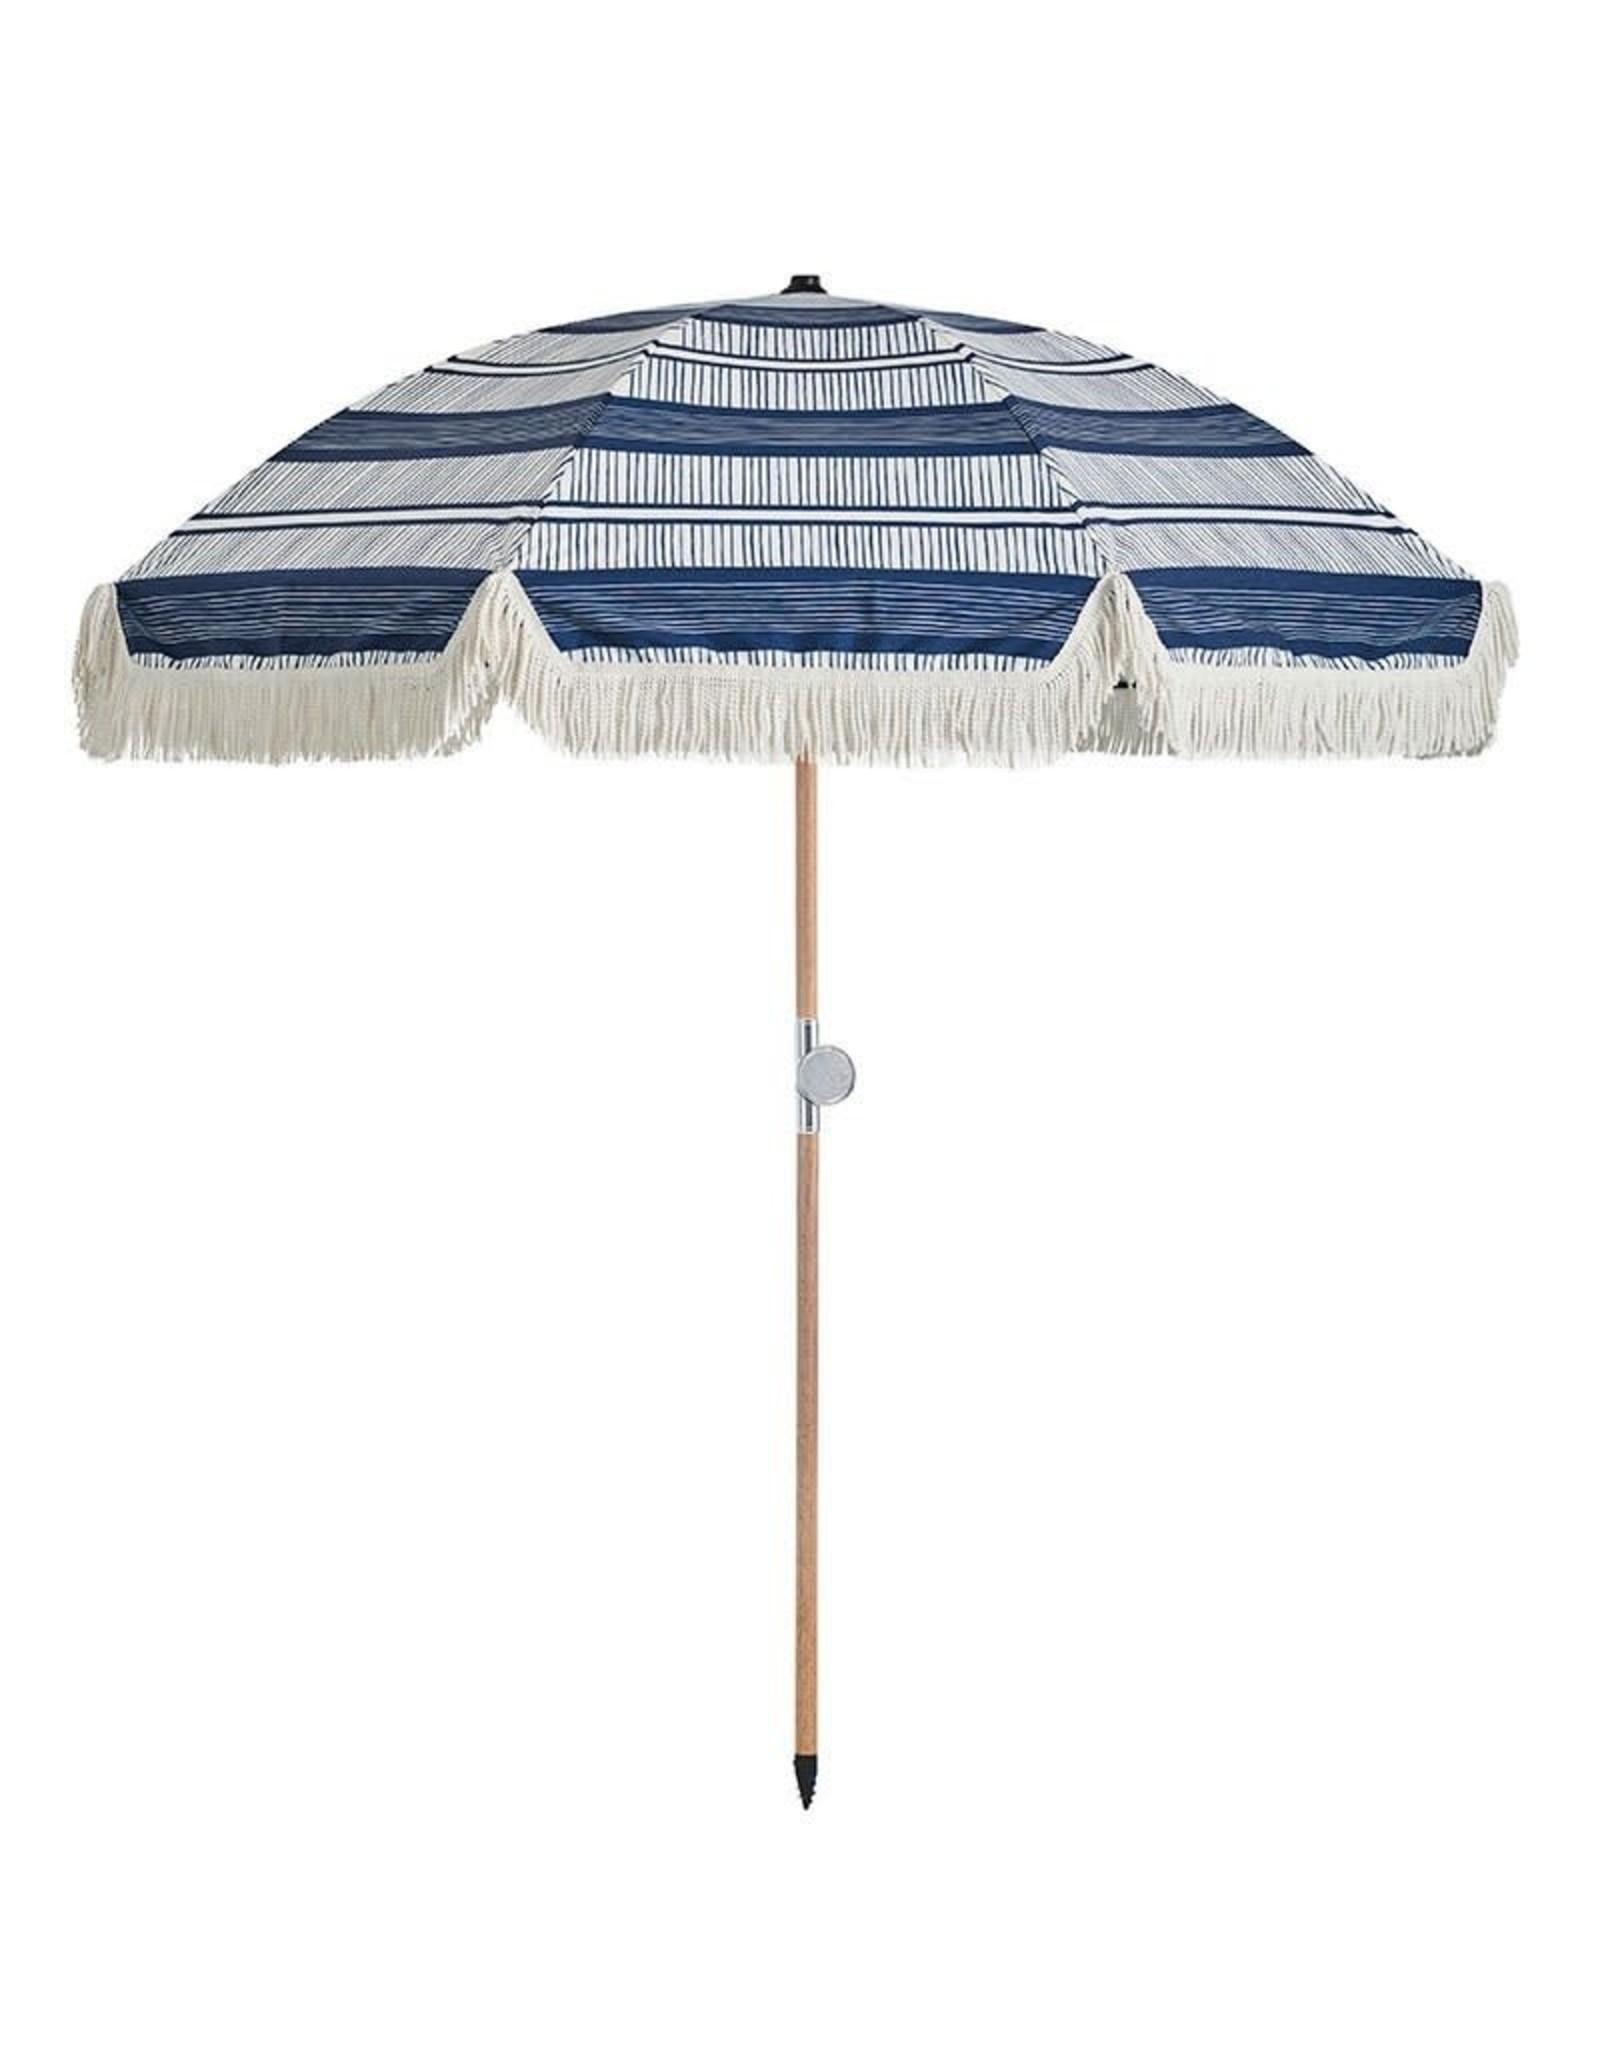 Basil Bangs Atlantic Beach Umbrella